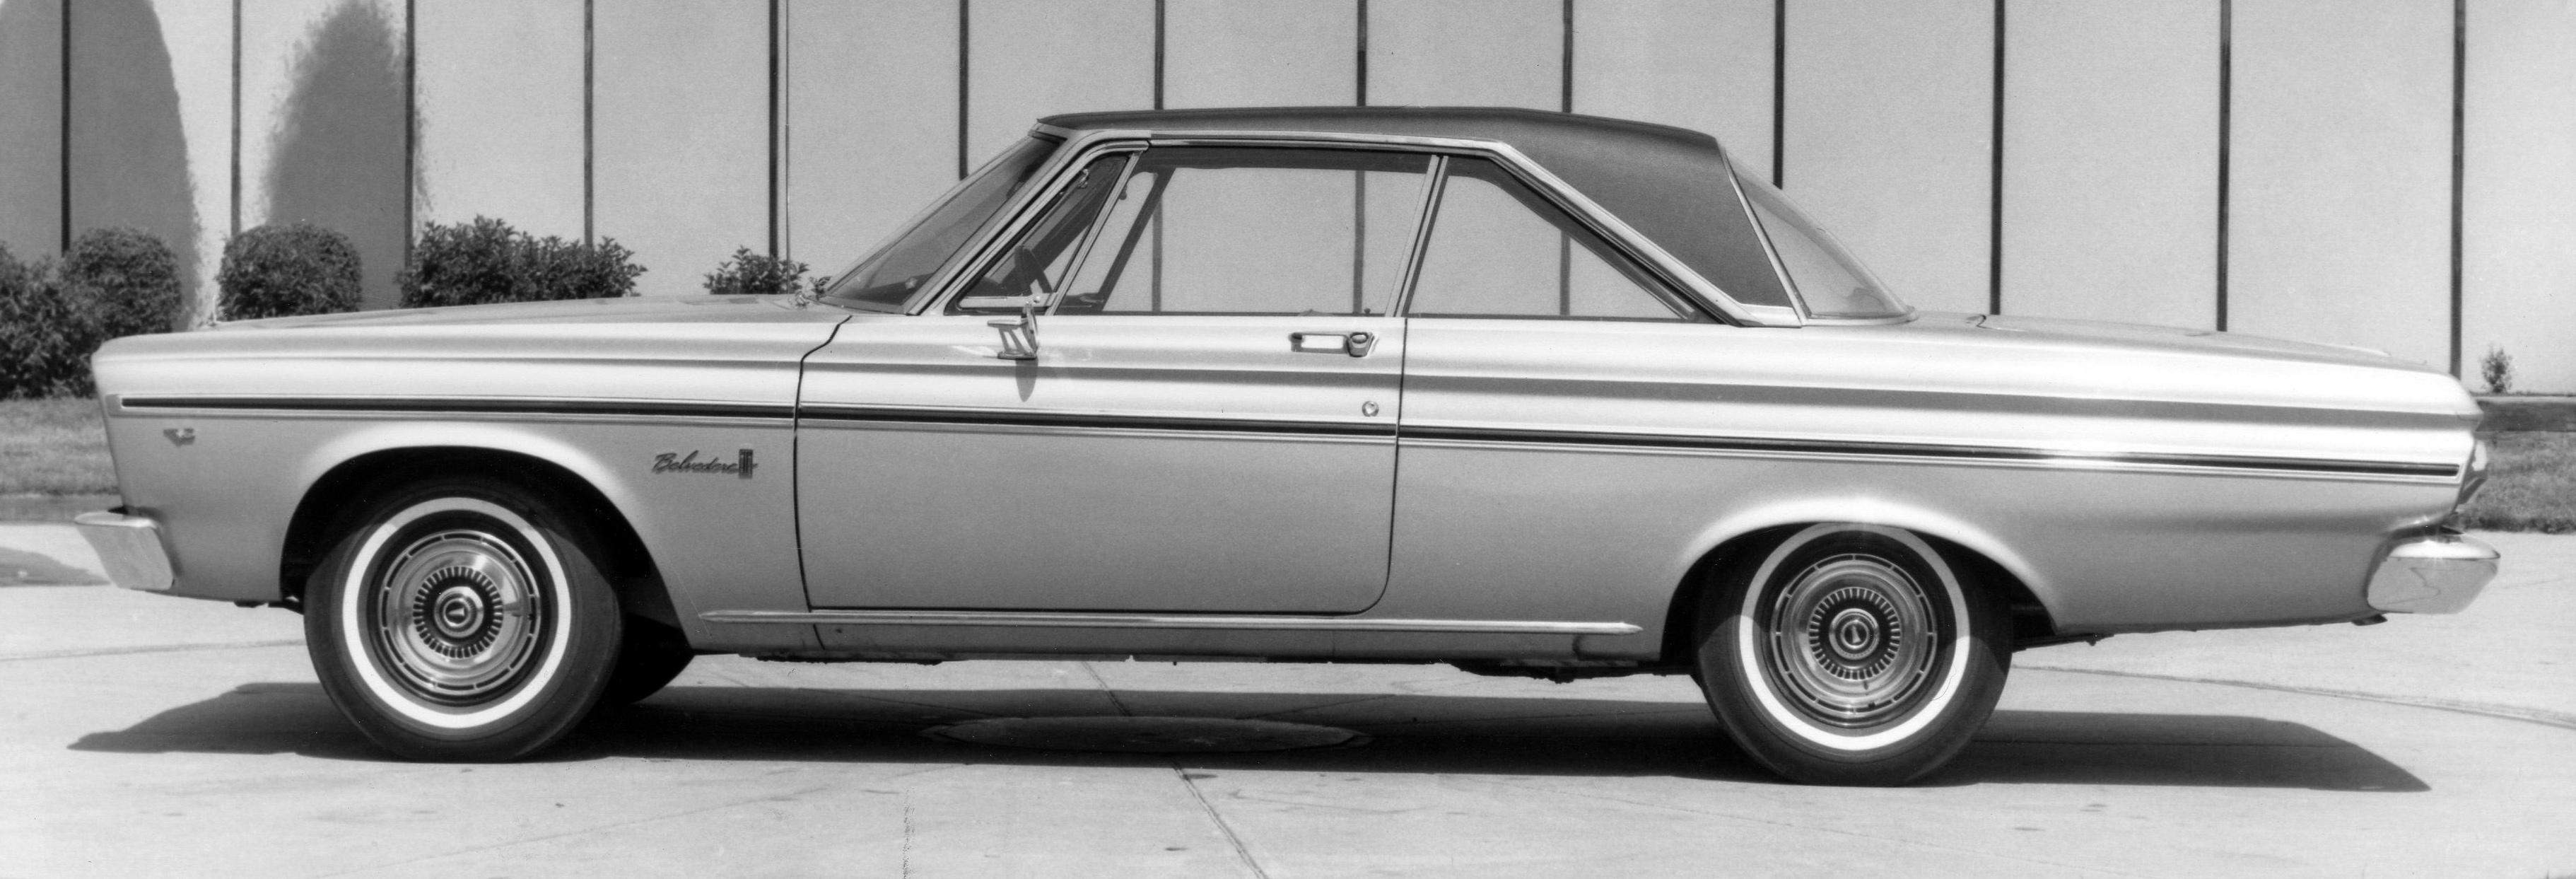 Future classic: 1965 426-Hemi Dodge, Plymouth - ClassicCars.com ...